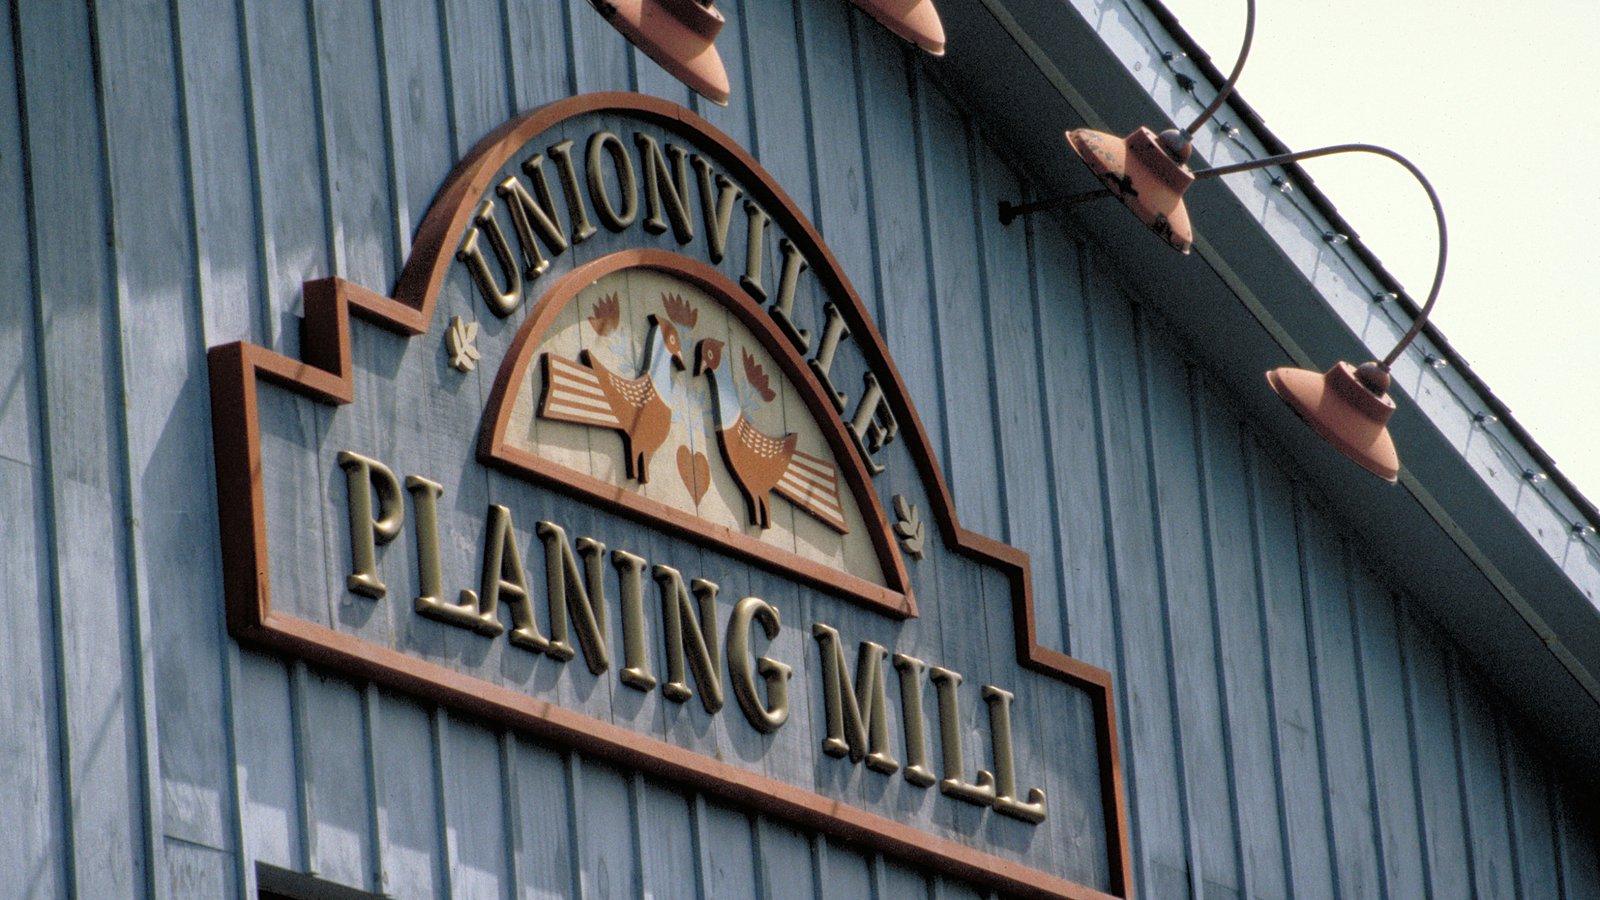 Unionville featuring signage